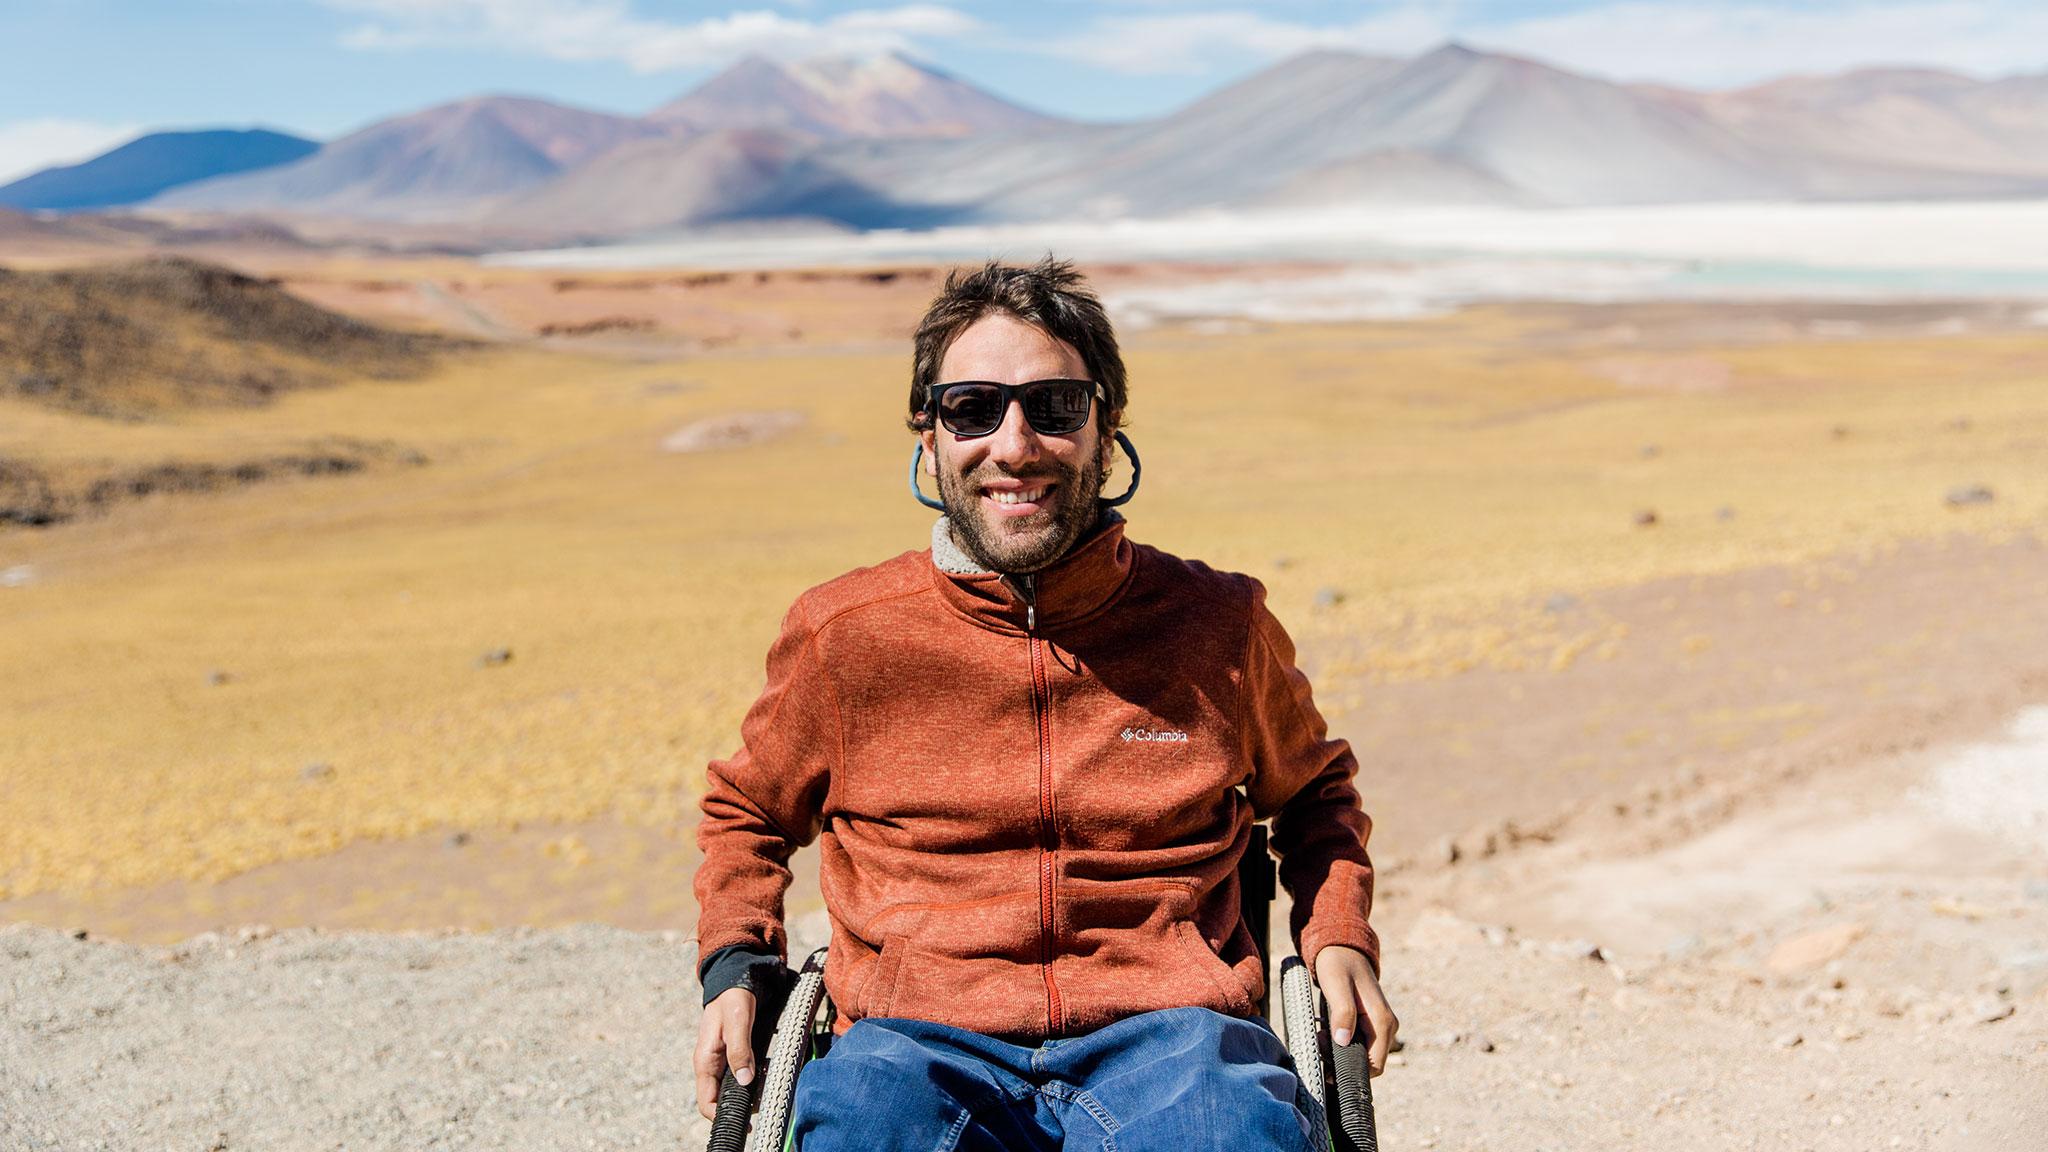 Disabled adventure travel entrepreneur's MBA journey